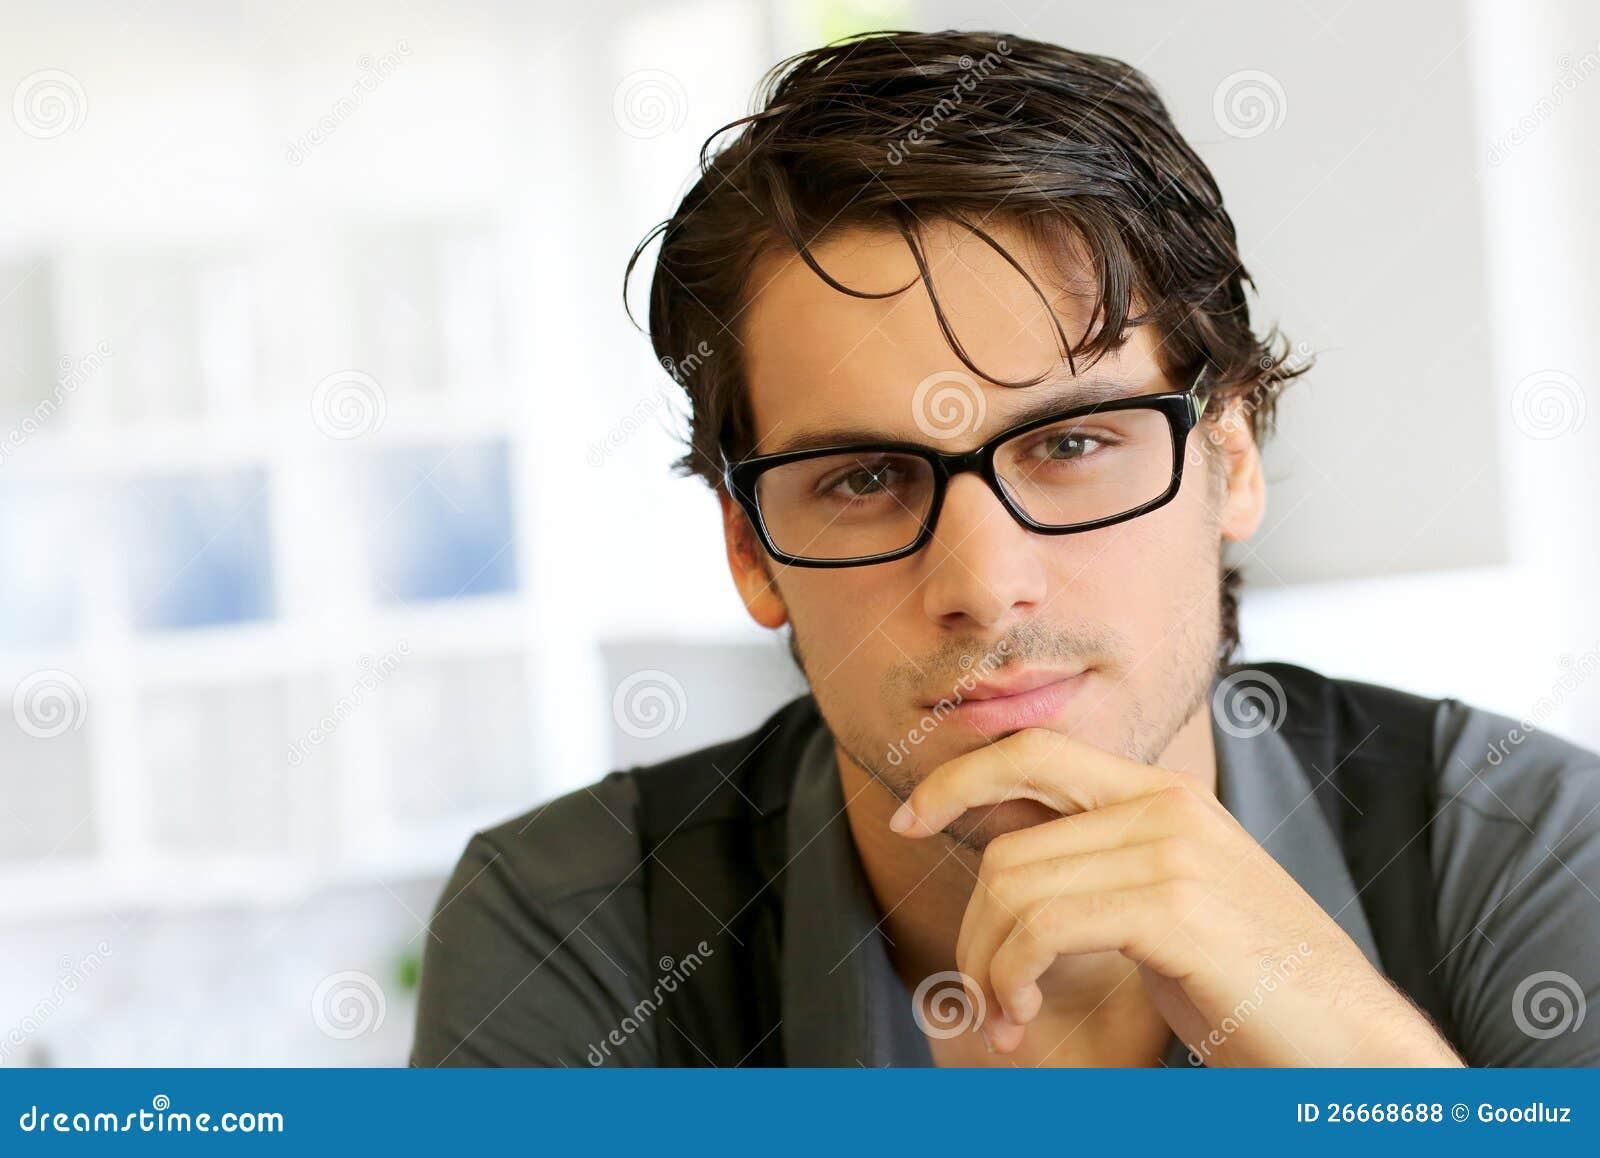 Asian Man Motocycle Glasses